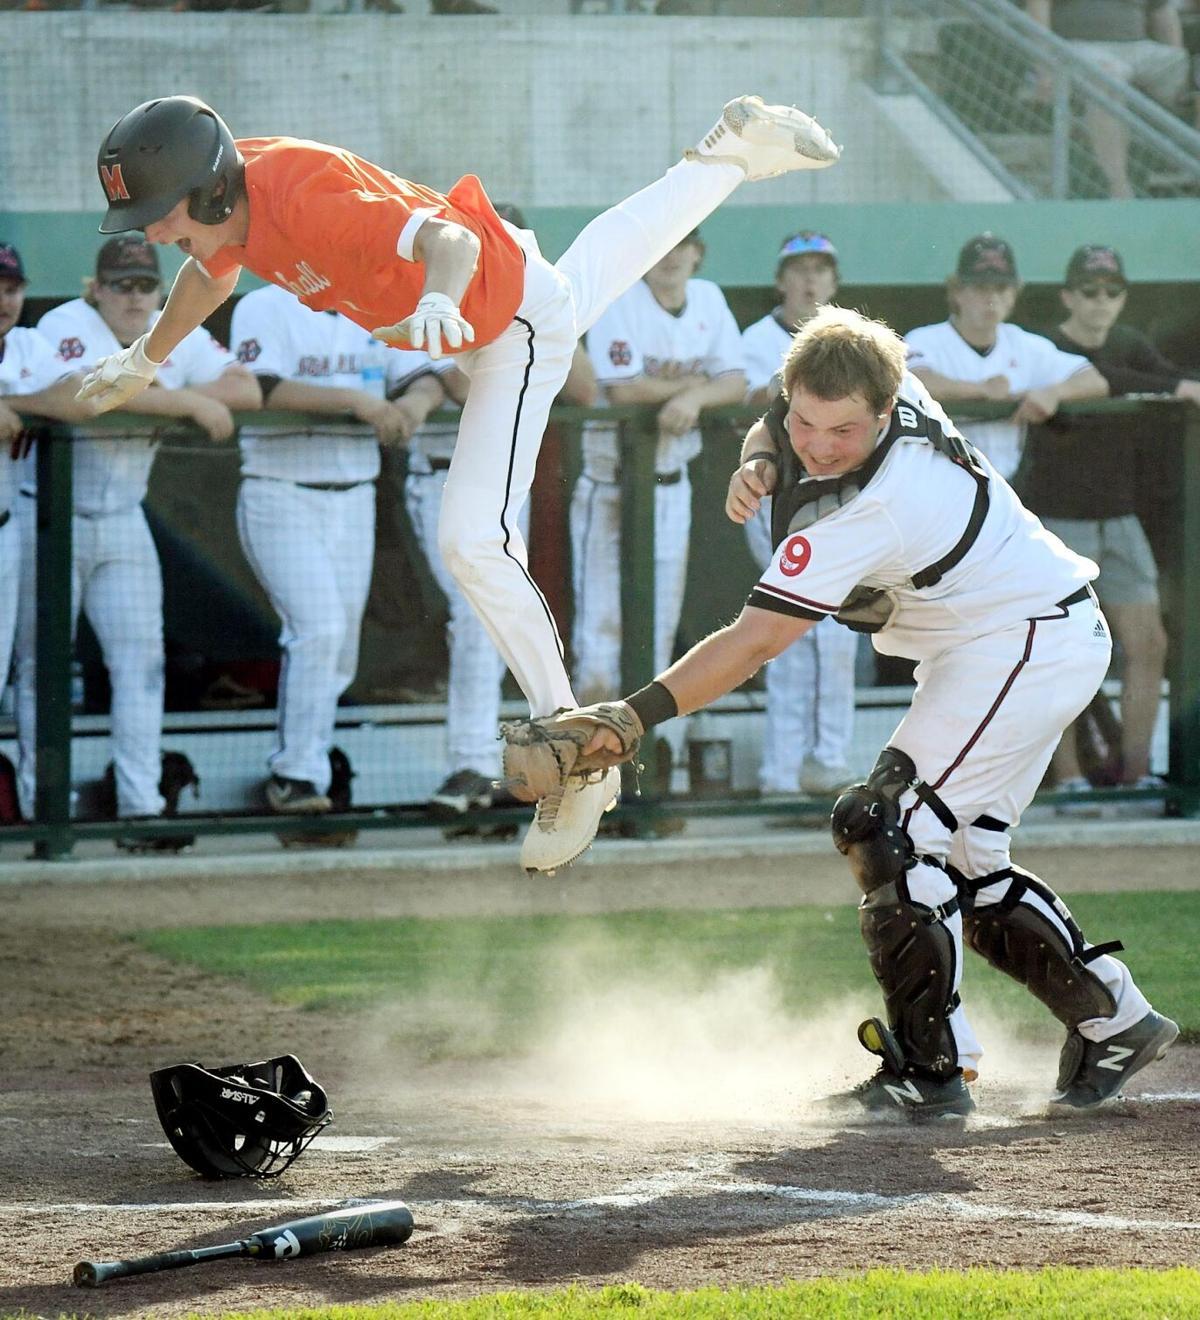 West baseball vs. Marshall 2